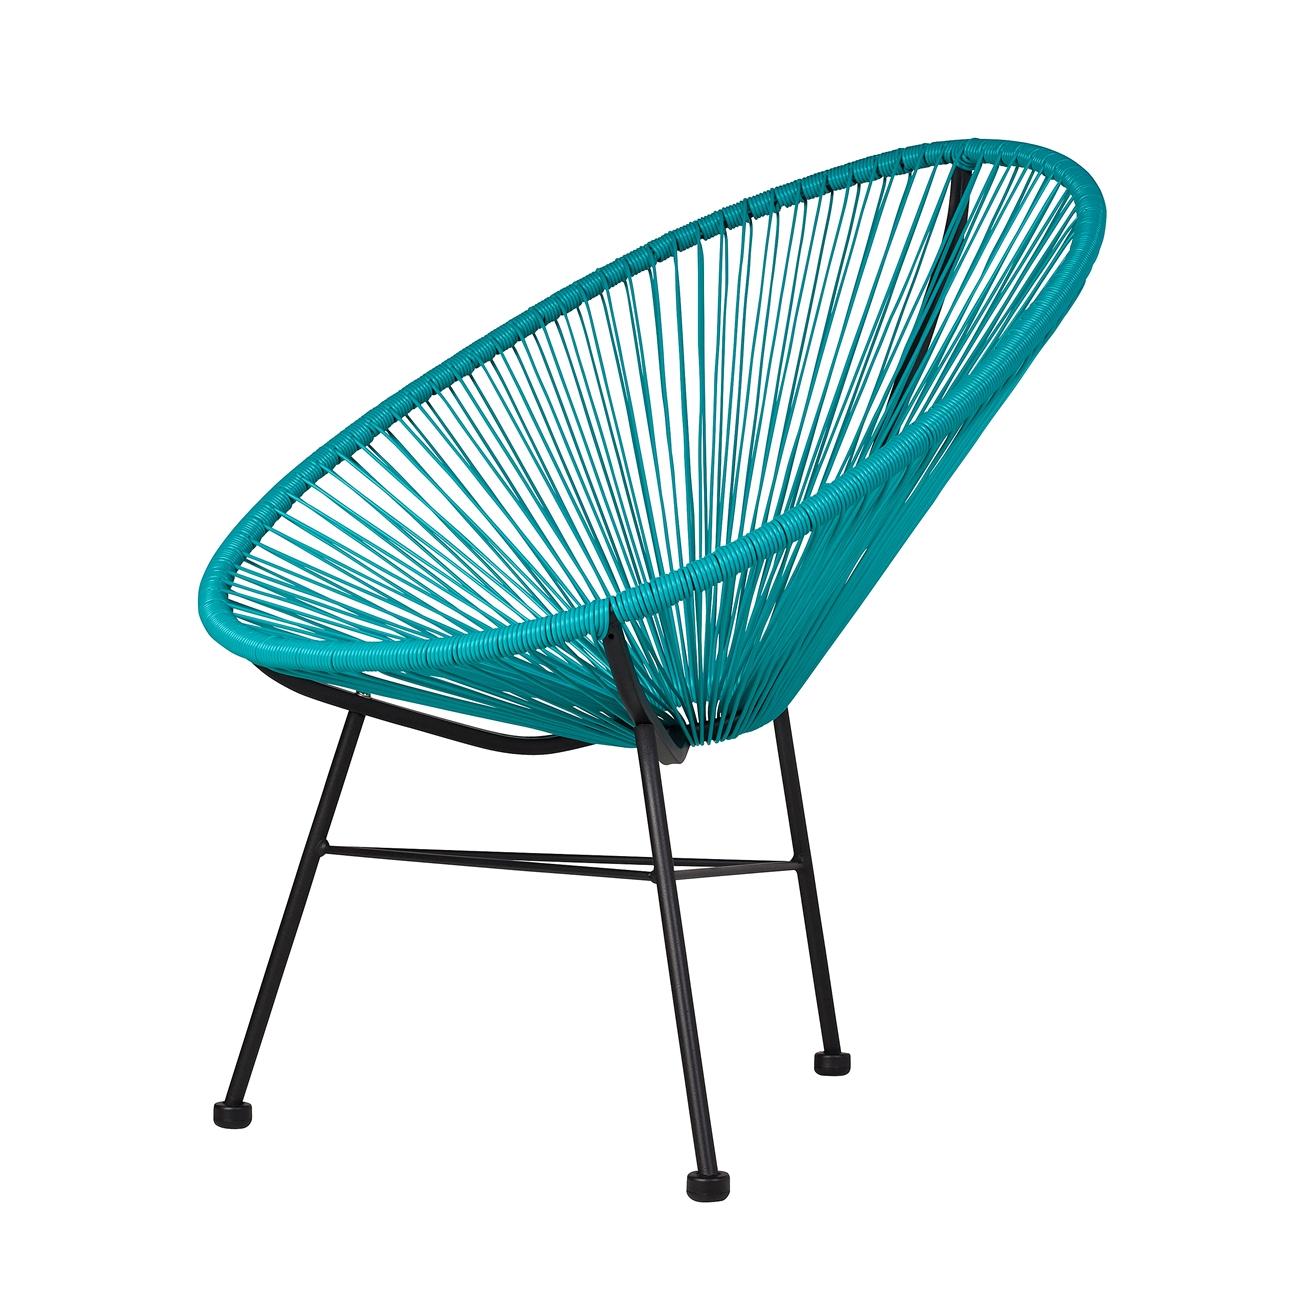 Acapulco Outdoor Lounge Chair Blue, The Khazana Home Austin ...